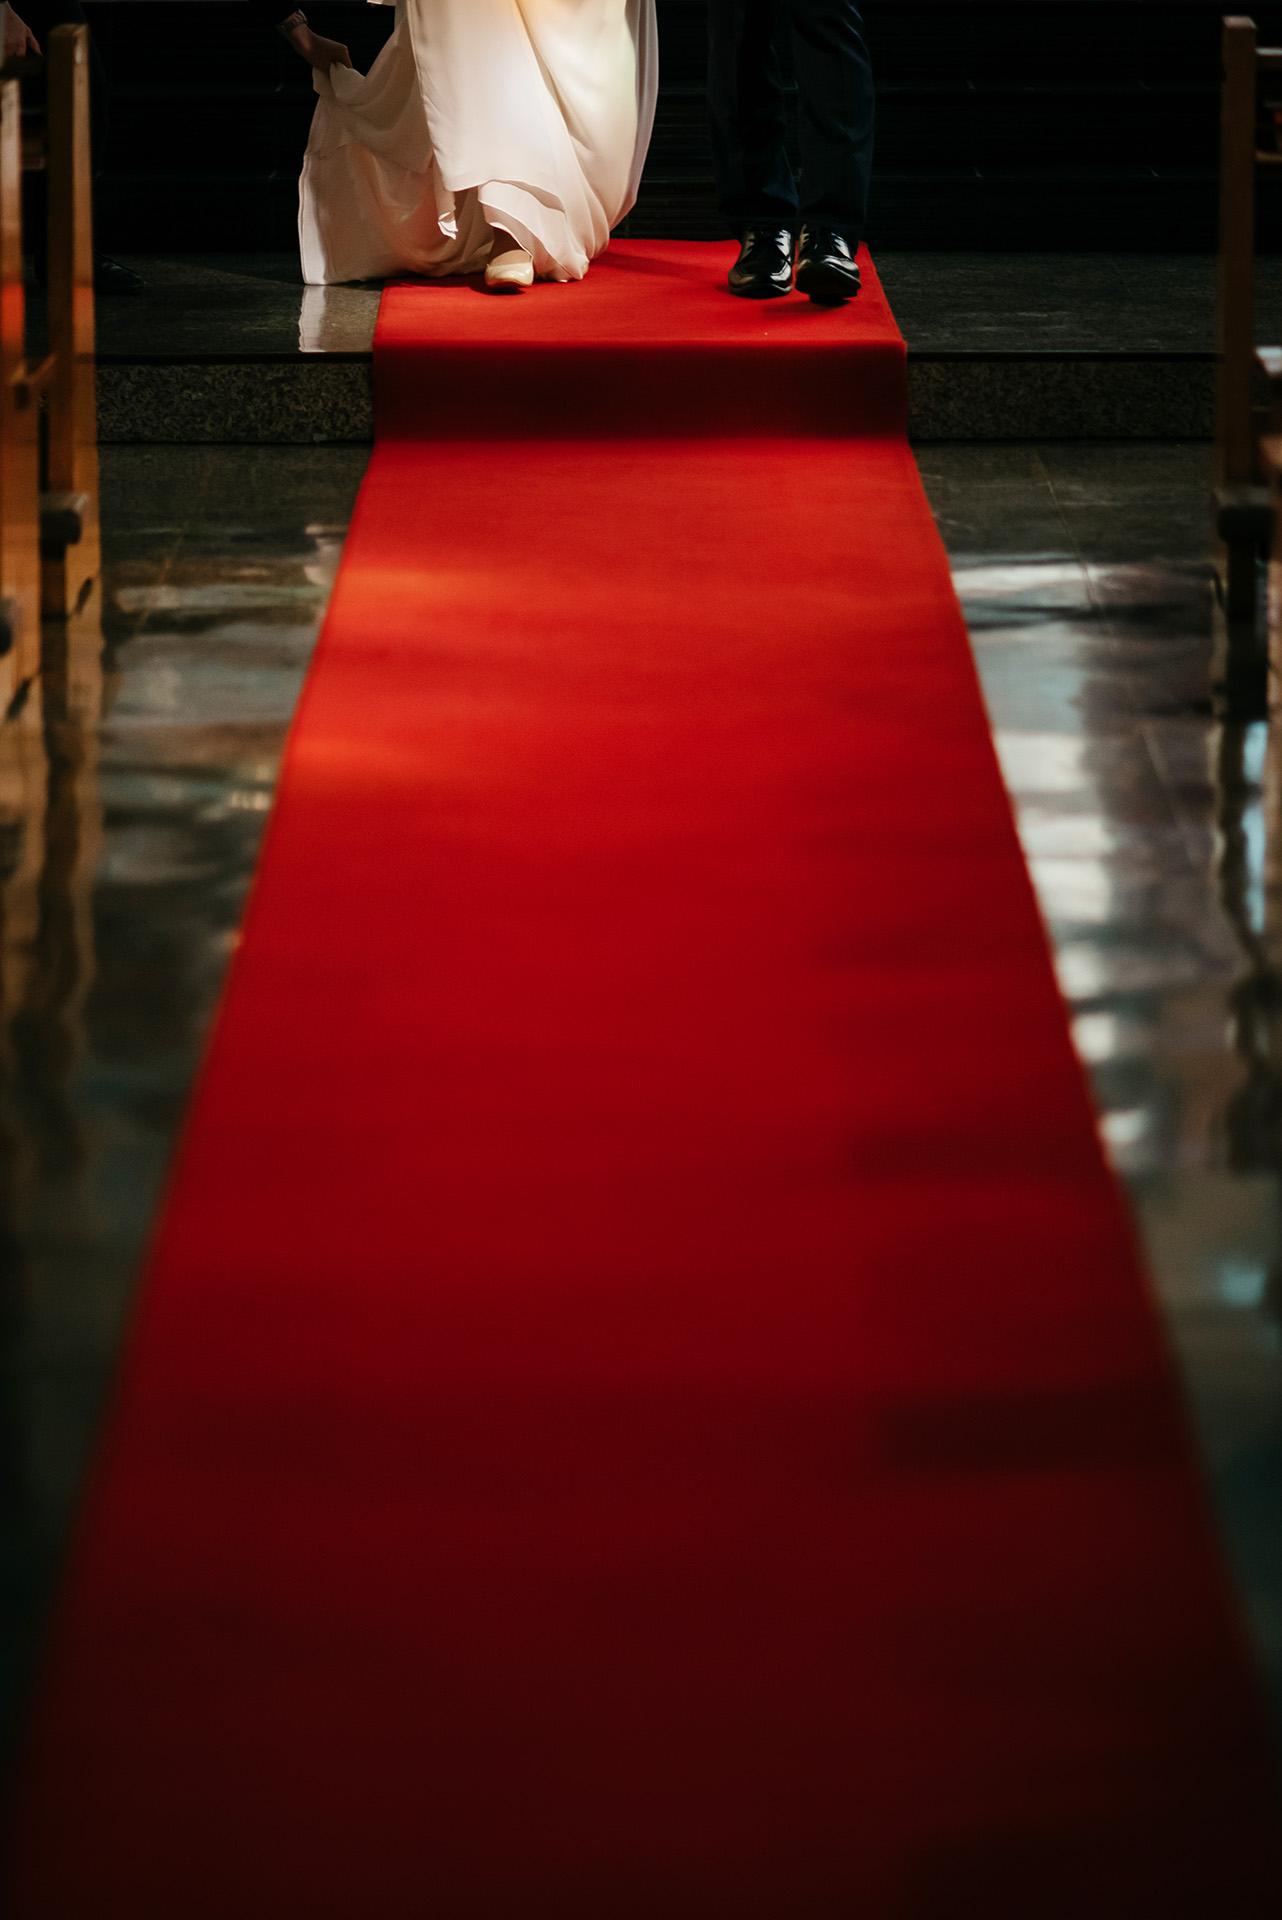 fika and fotos ウェディングフォト 結婚式のカメラマン 渋谷カトリック教会